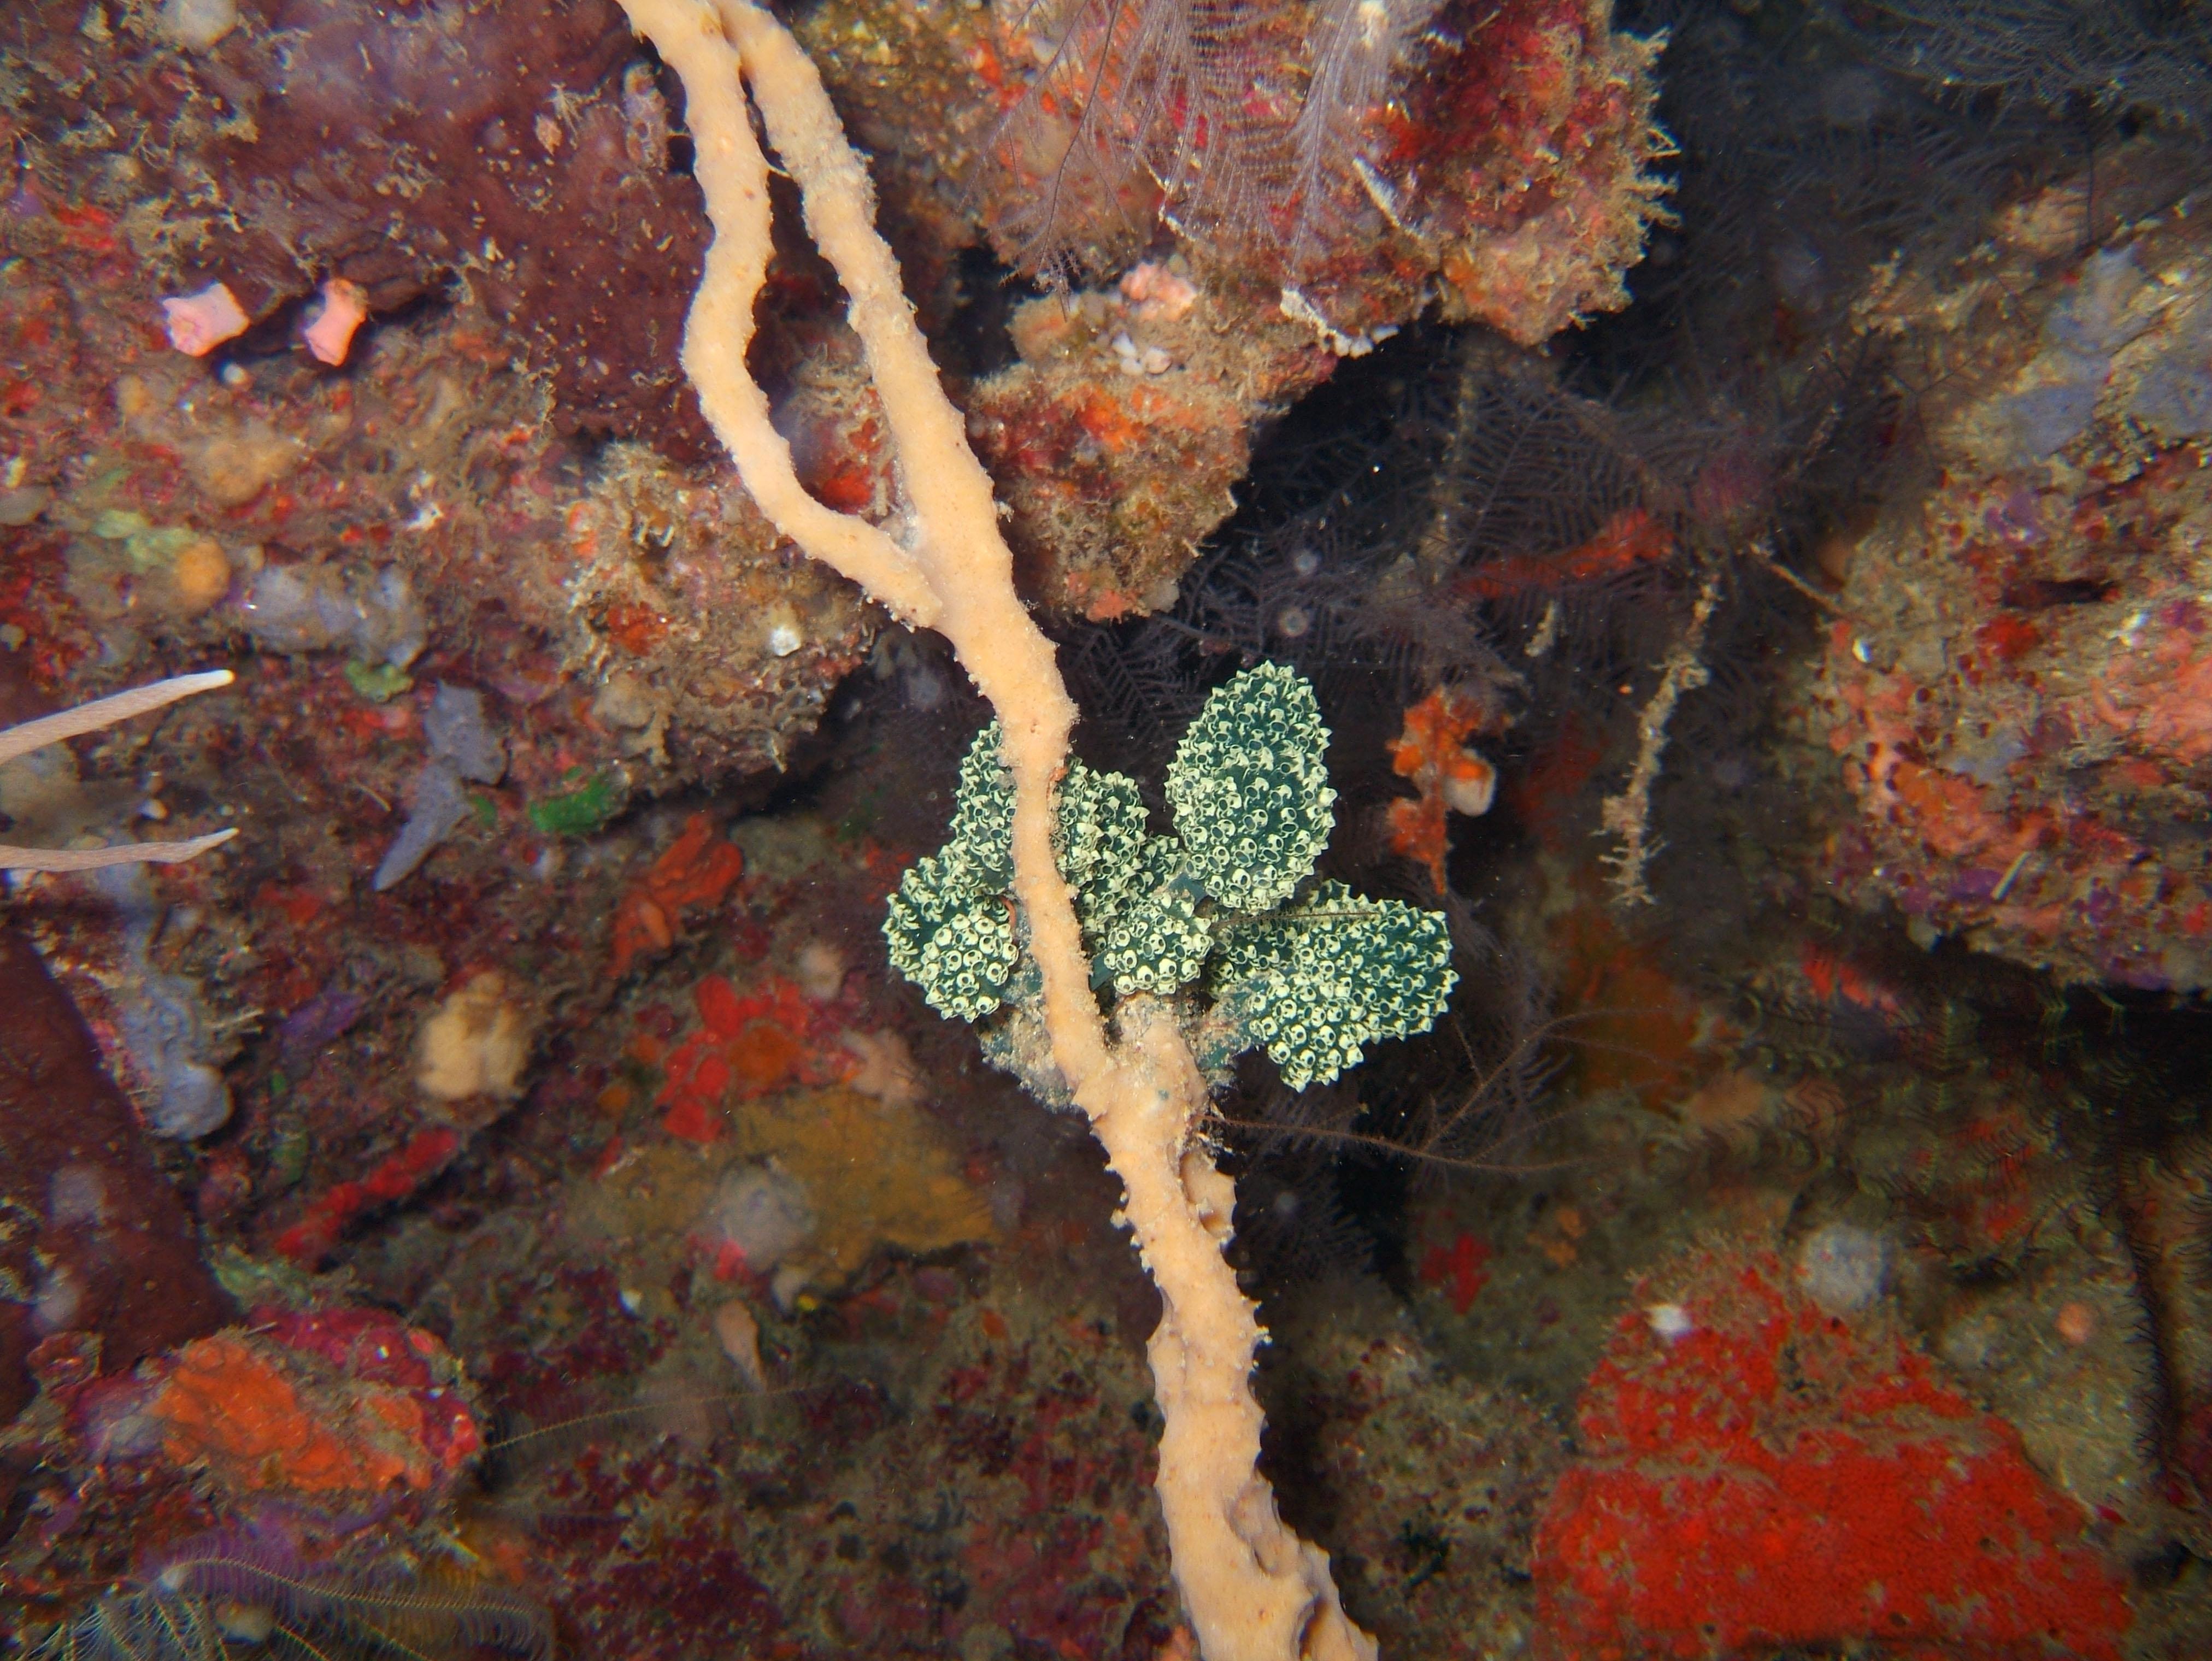 Coron dive site 11 Cay Angan Lake Baracuda Lake Reef July 2005 04